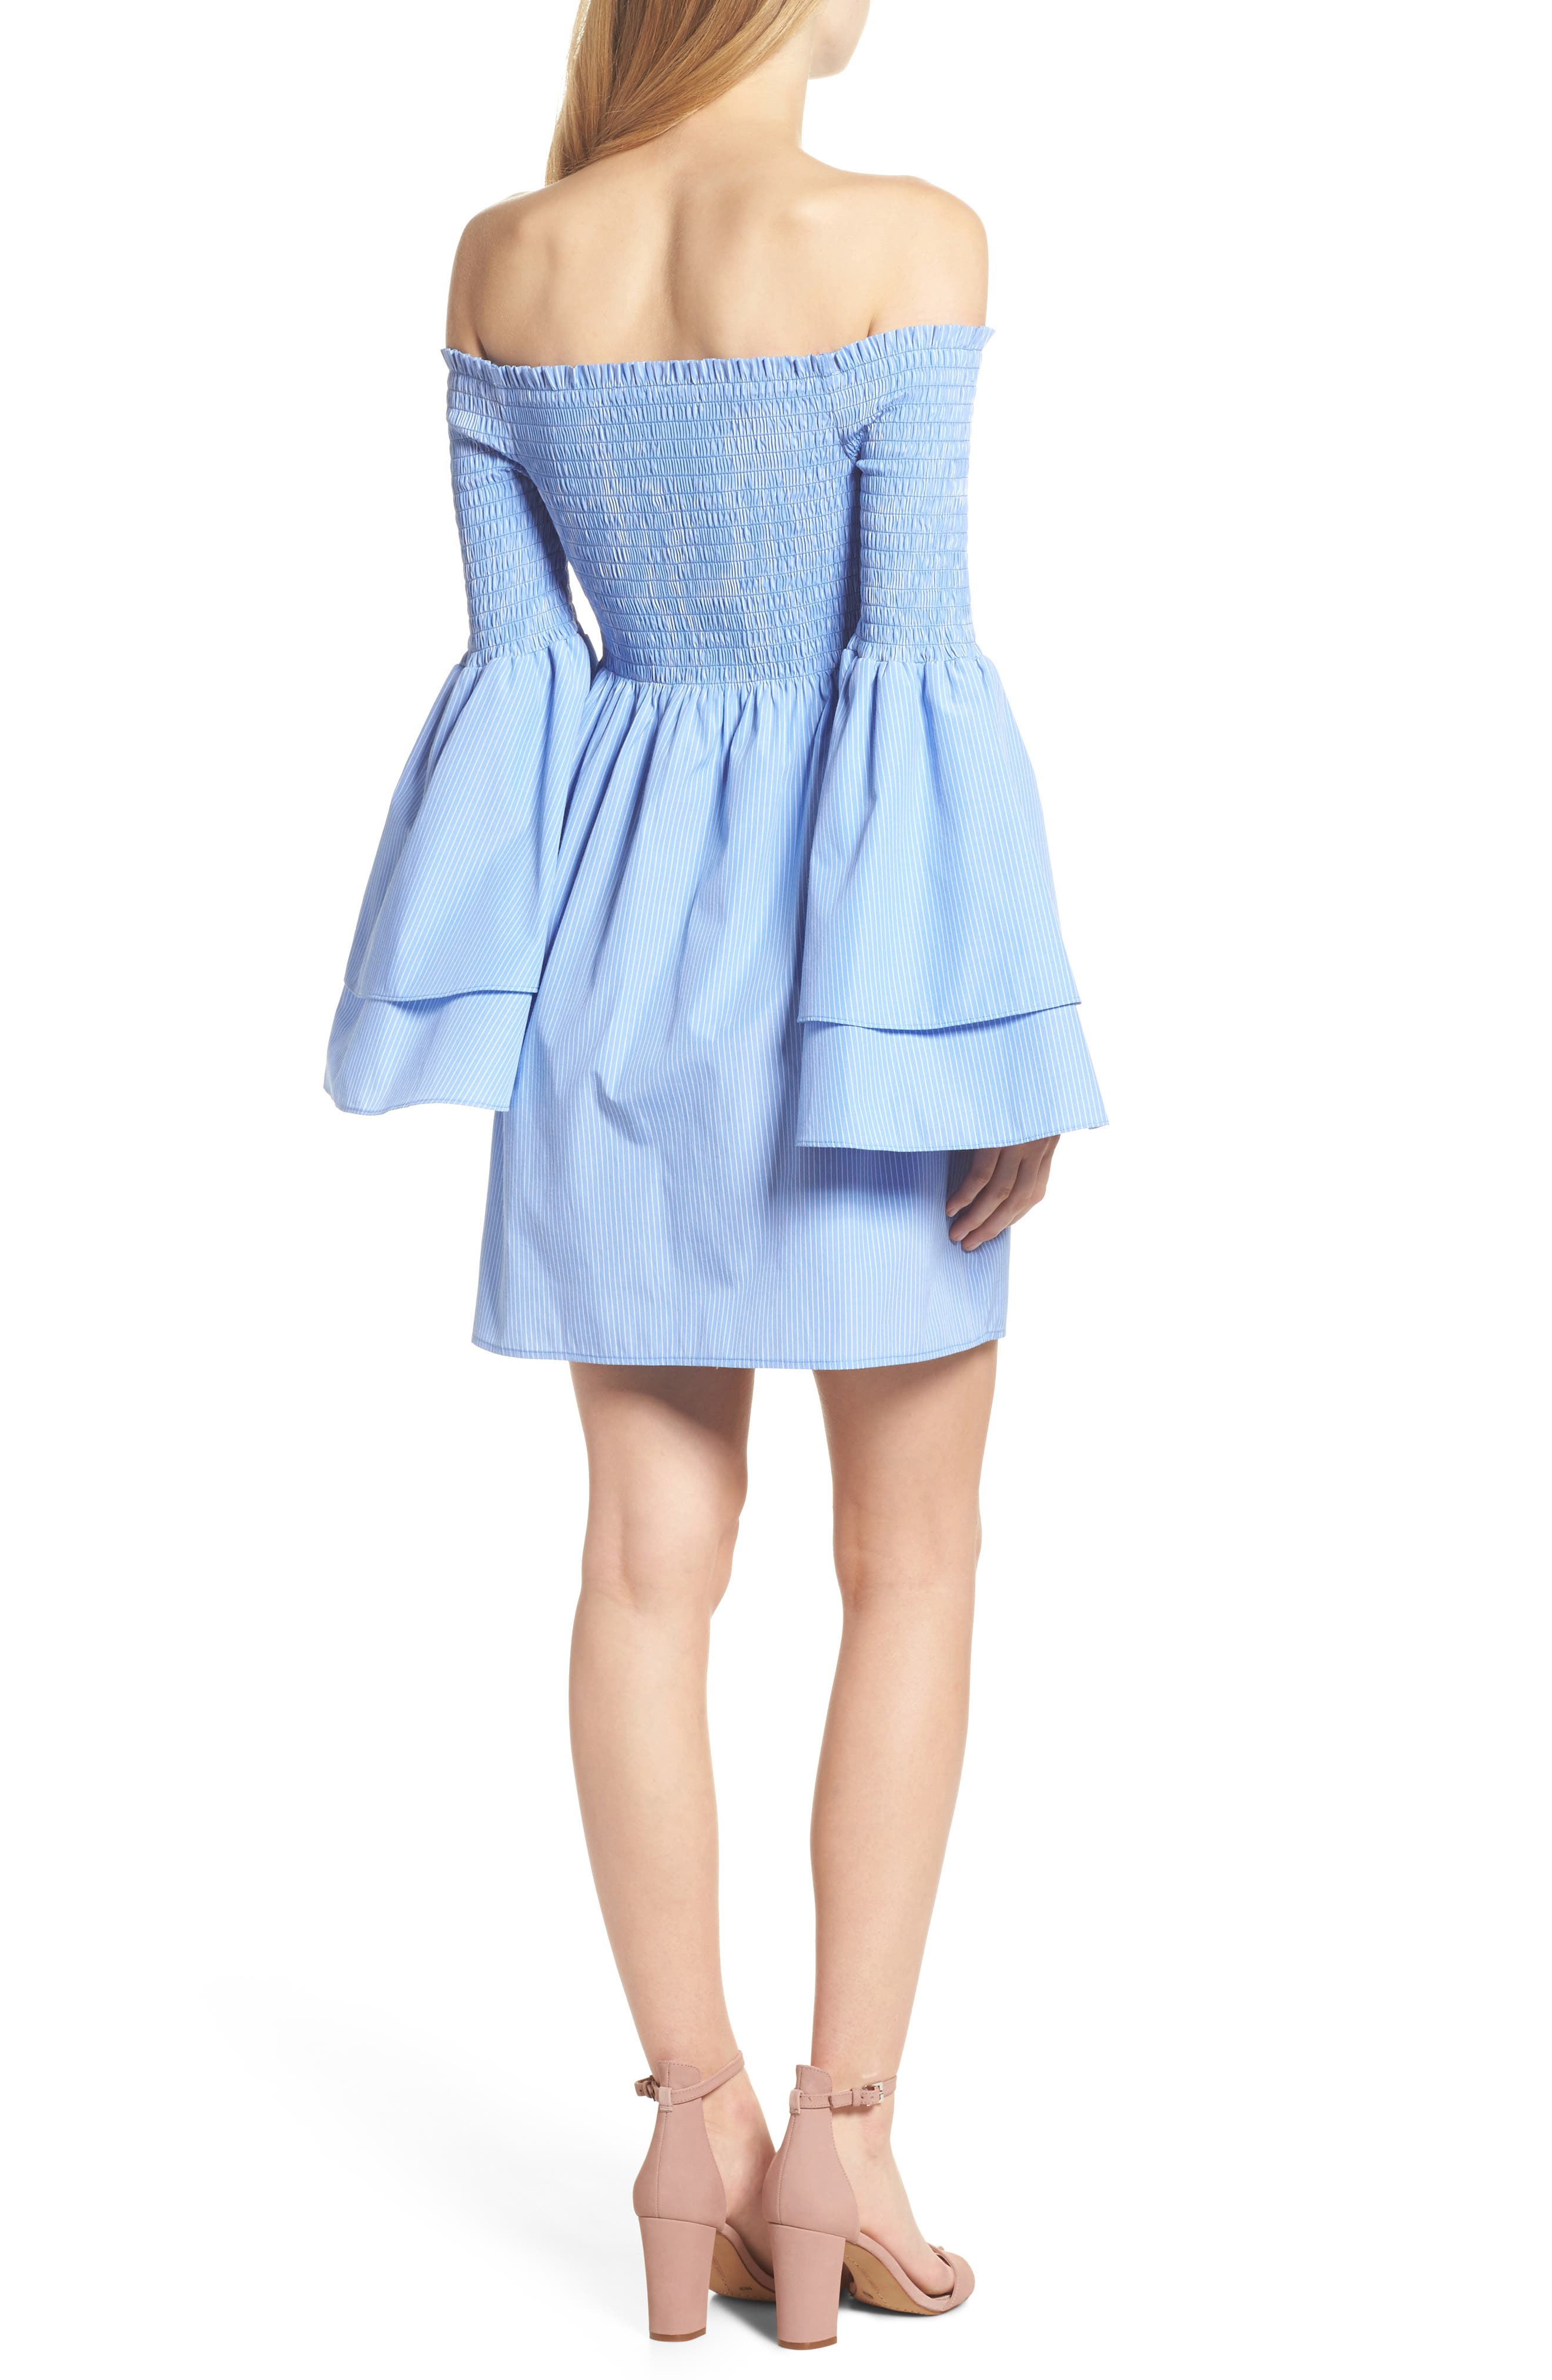 Smocked Off the Shoulder Bell Sleeve Dress,                             Alternate thumbnail 2, color,                             Blue/ White Stripe